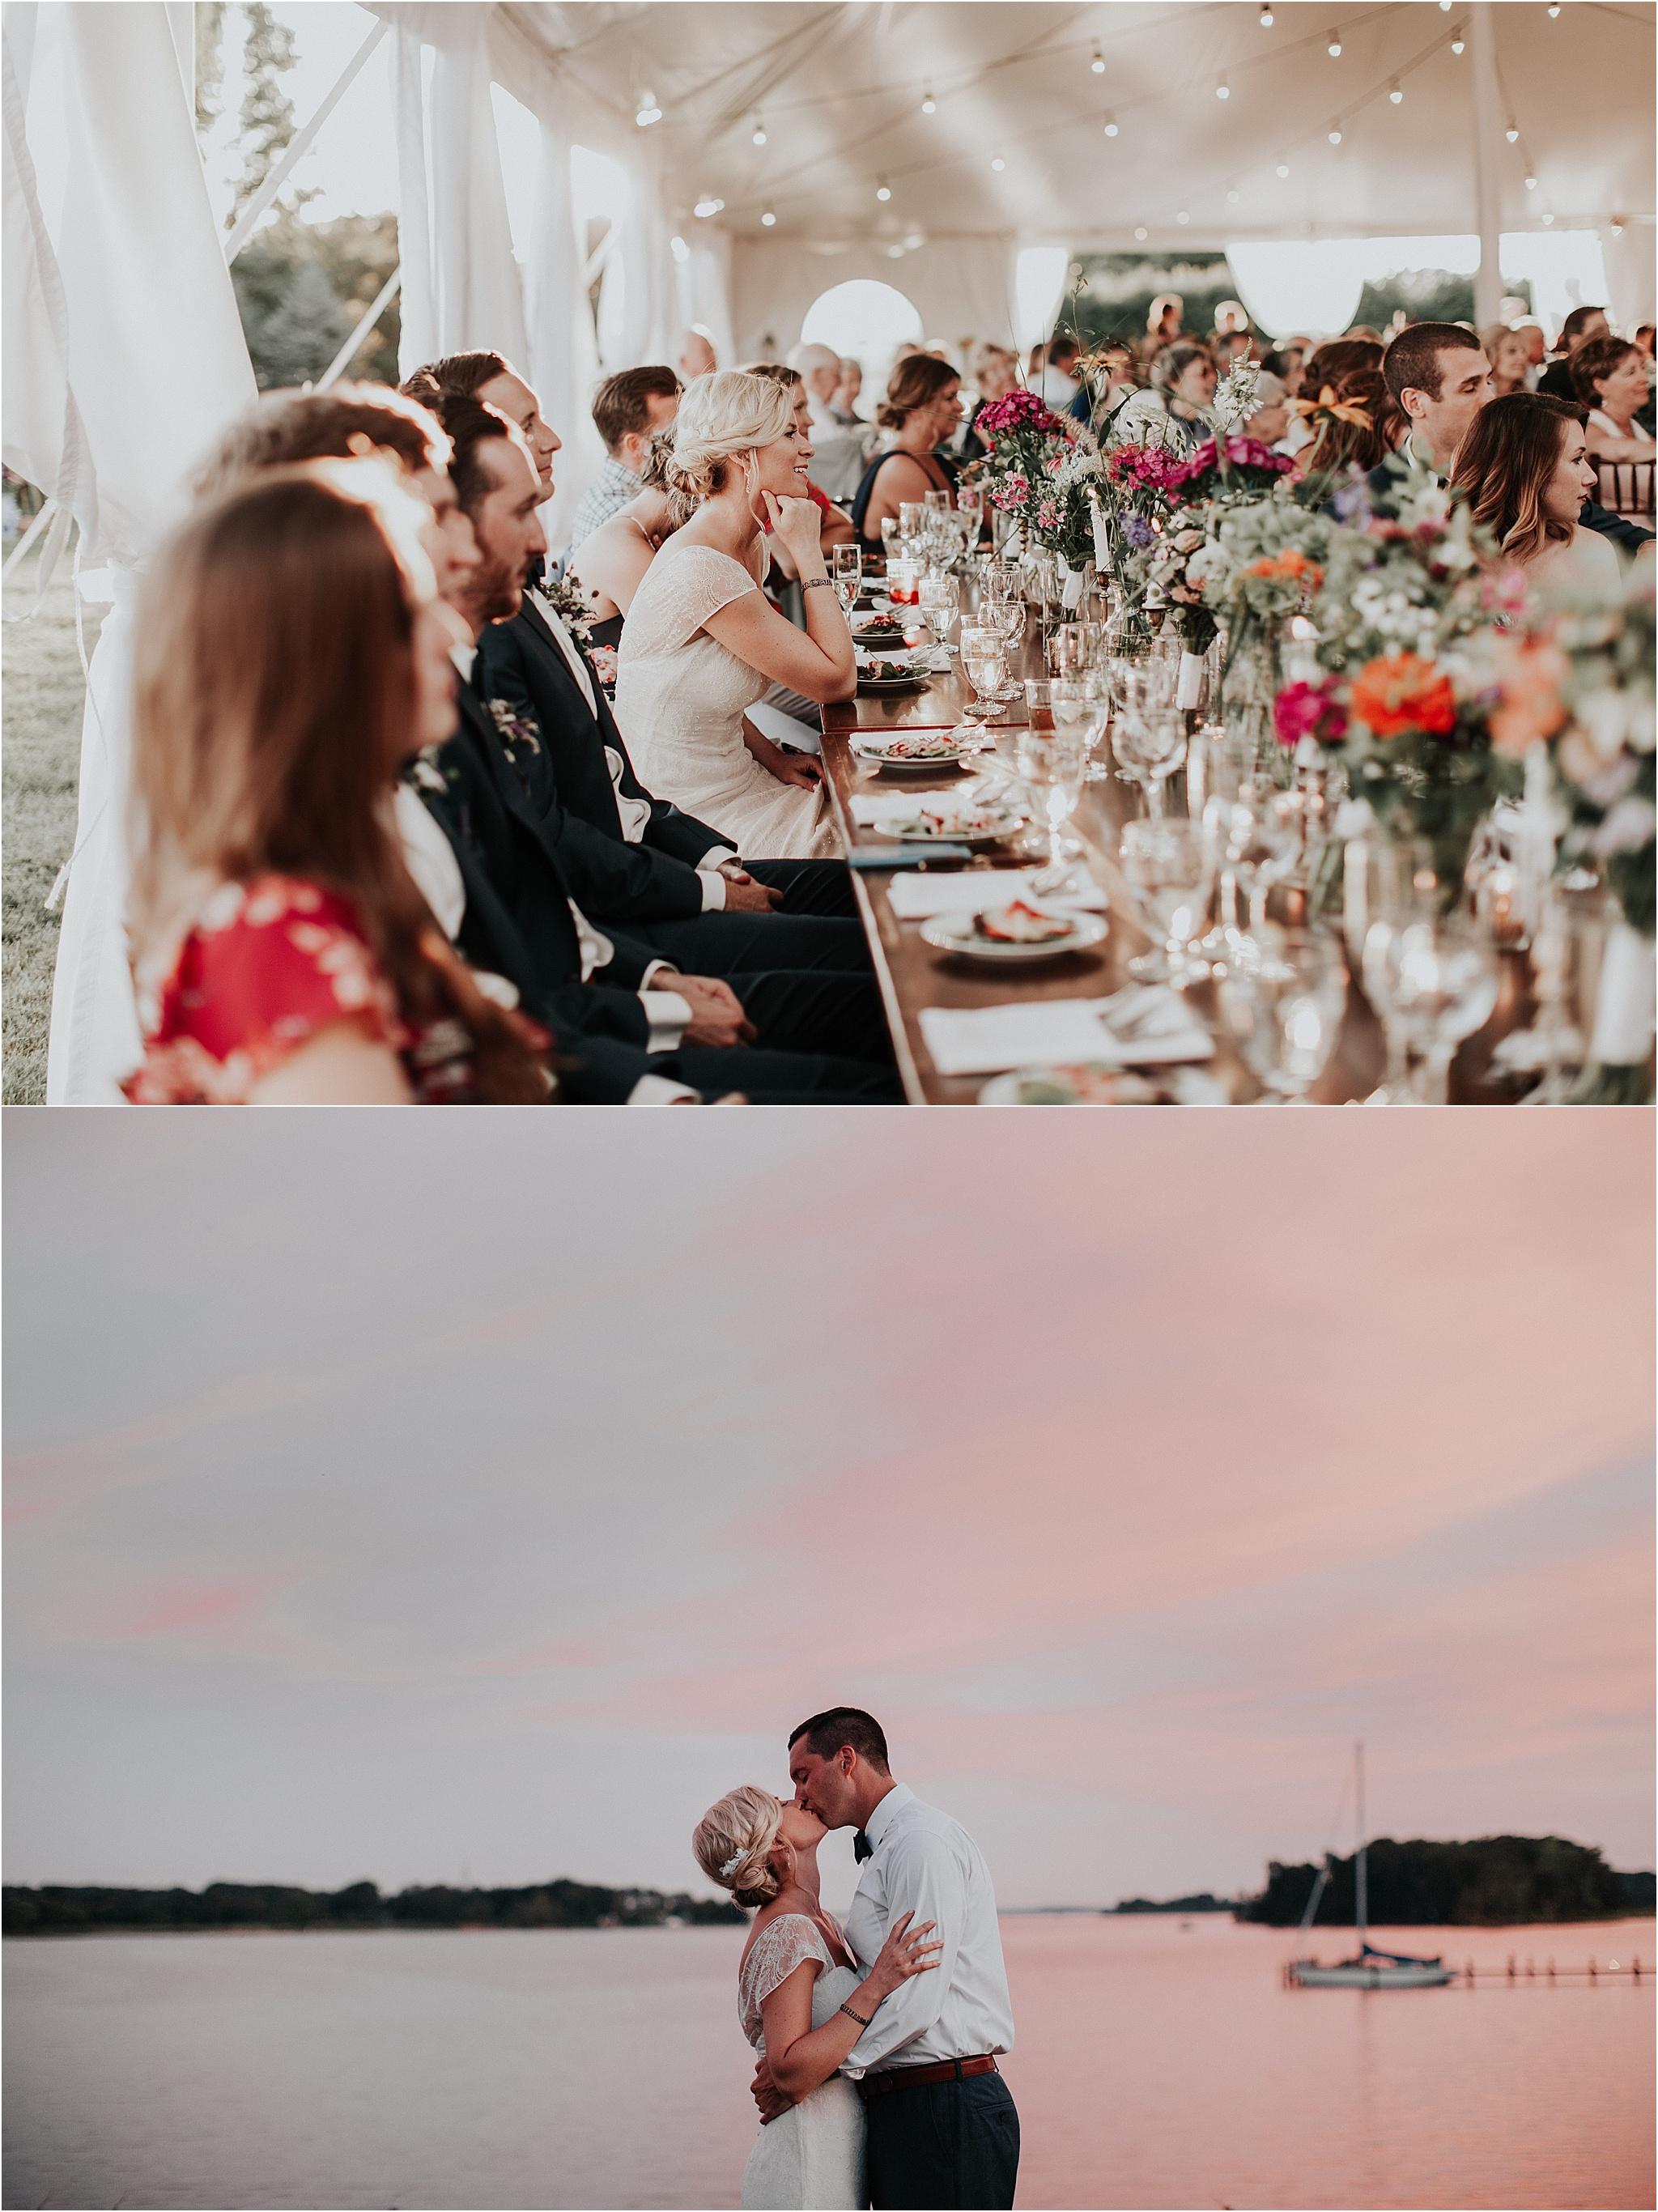 Sarah_Brookhart_Baltimore_Philly_Wedding_Photographer_0035.jpg